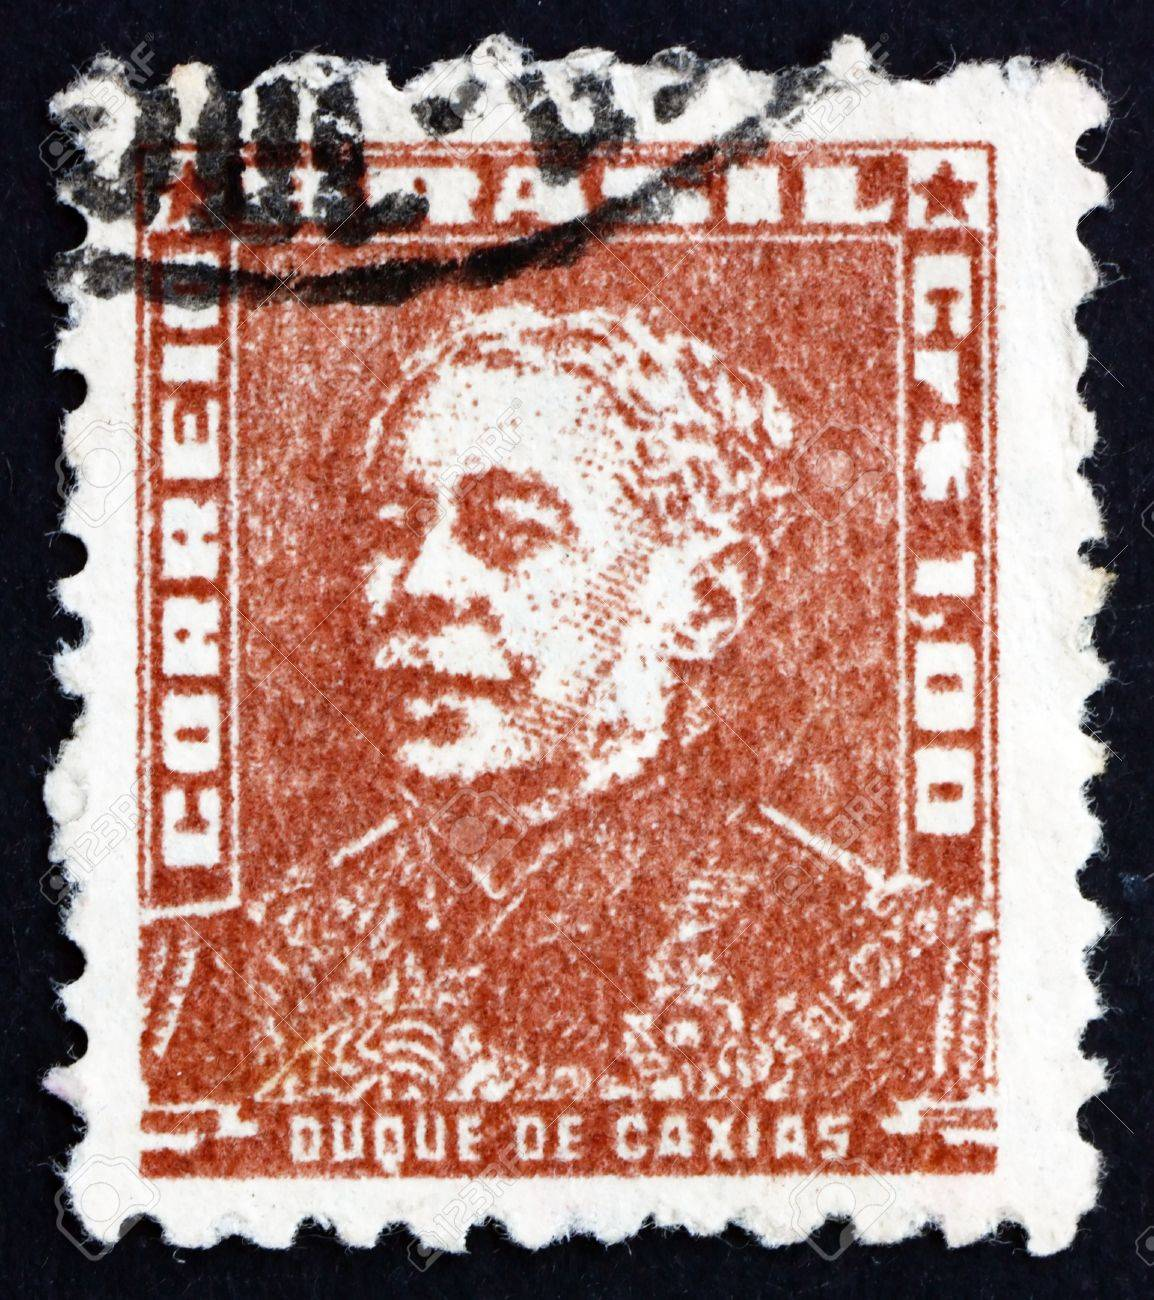 BRAZIL - CIRCA 1954: a stamp printed in the Brazil shows Duke of Caxias, Luis Alves de Lima e Silva, Officer, Politician and Monarchist, Army Marshal, circa 1954 Stock Photo - 17003834